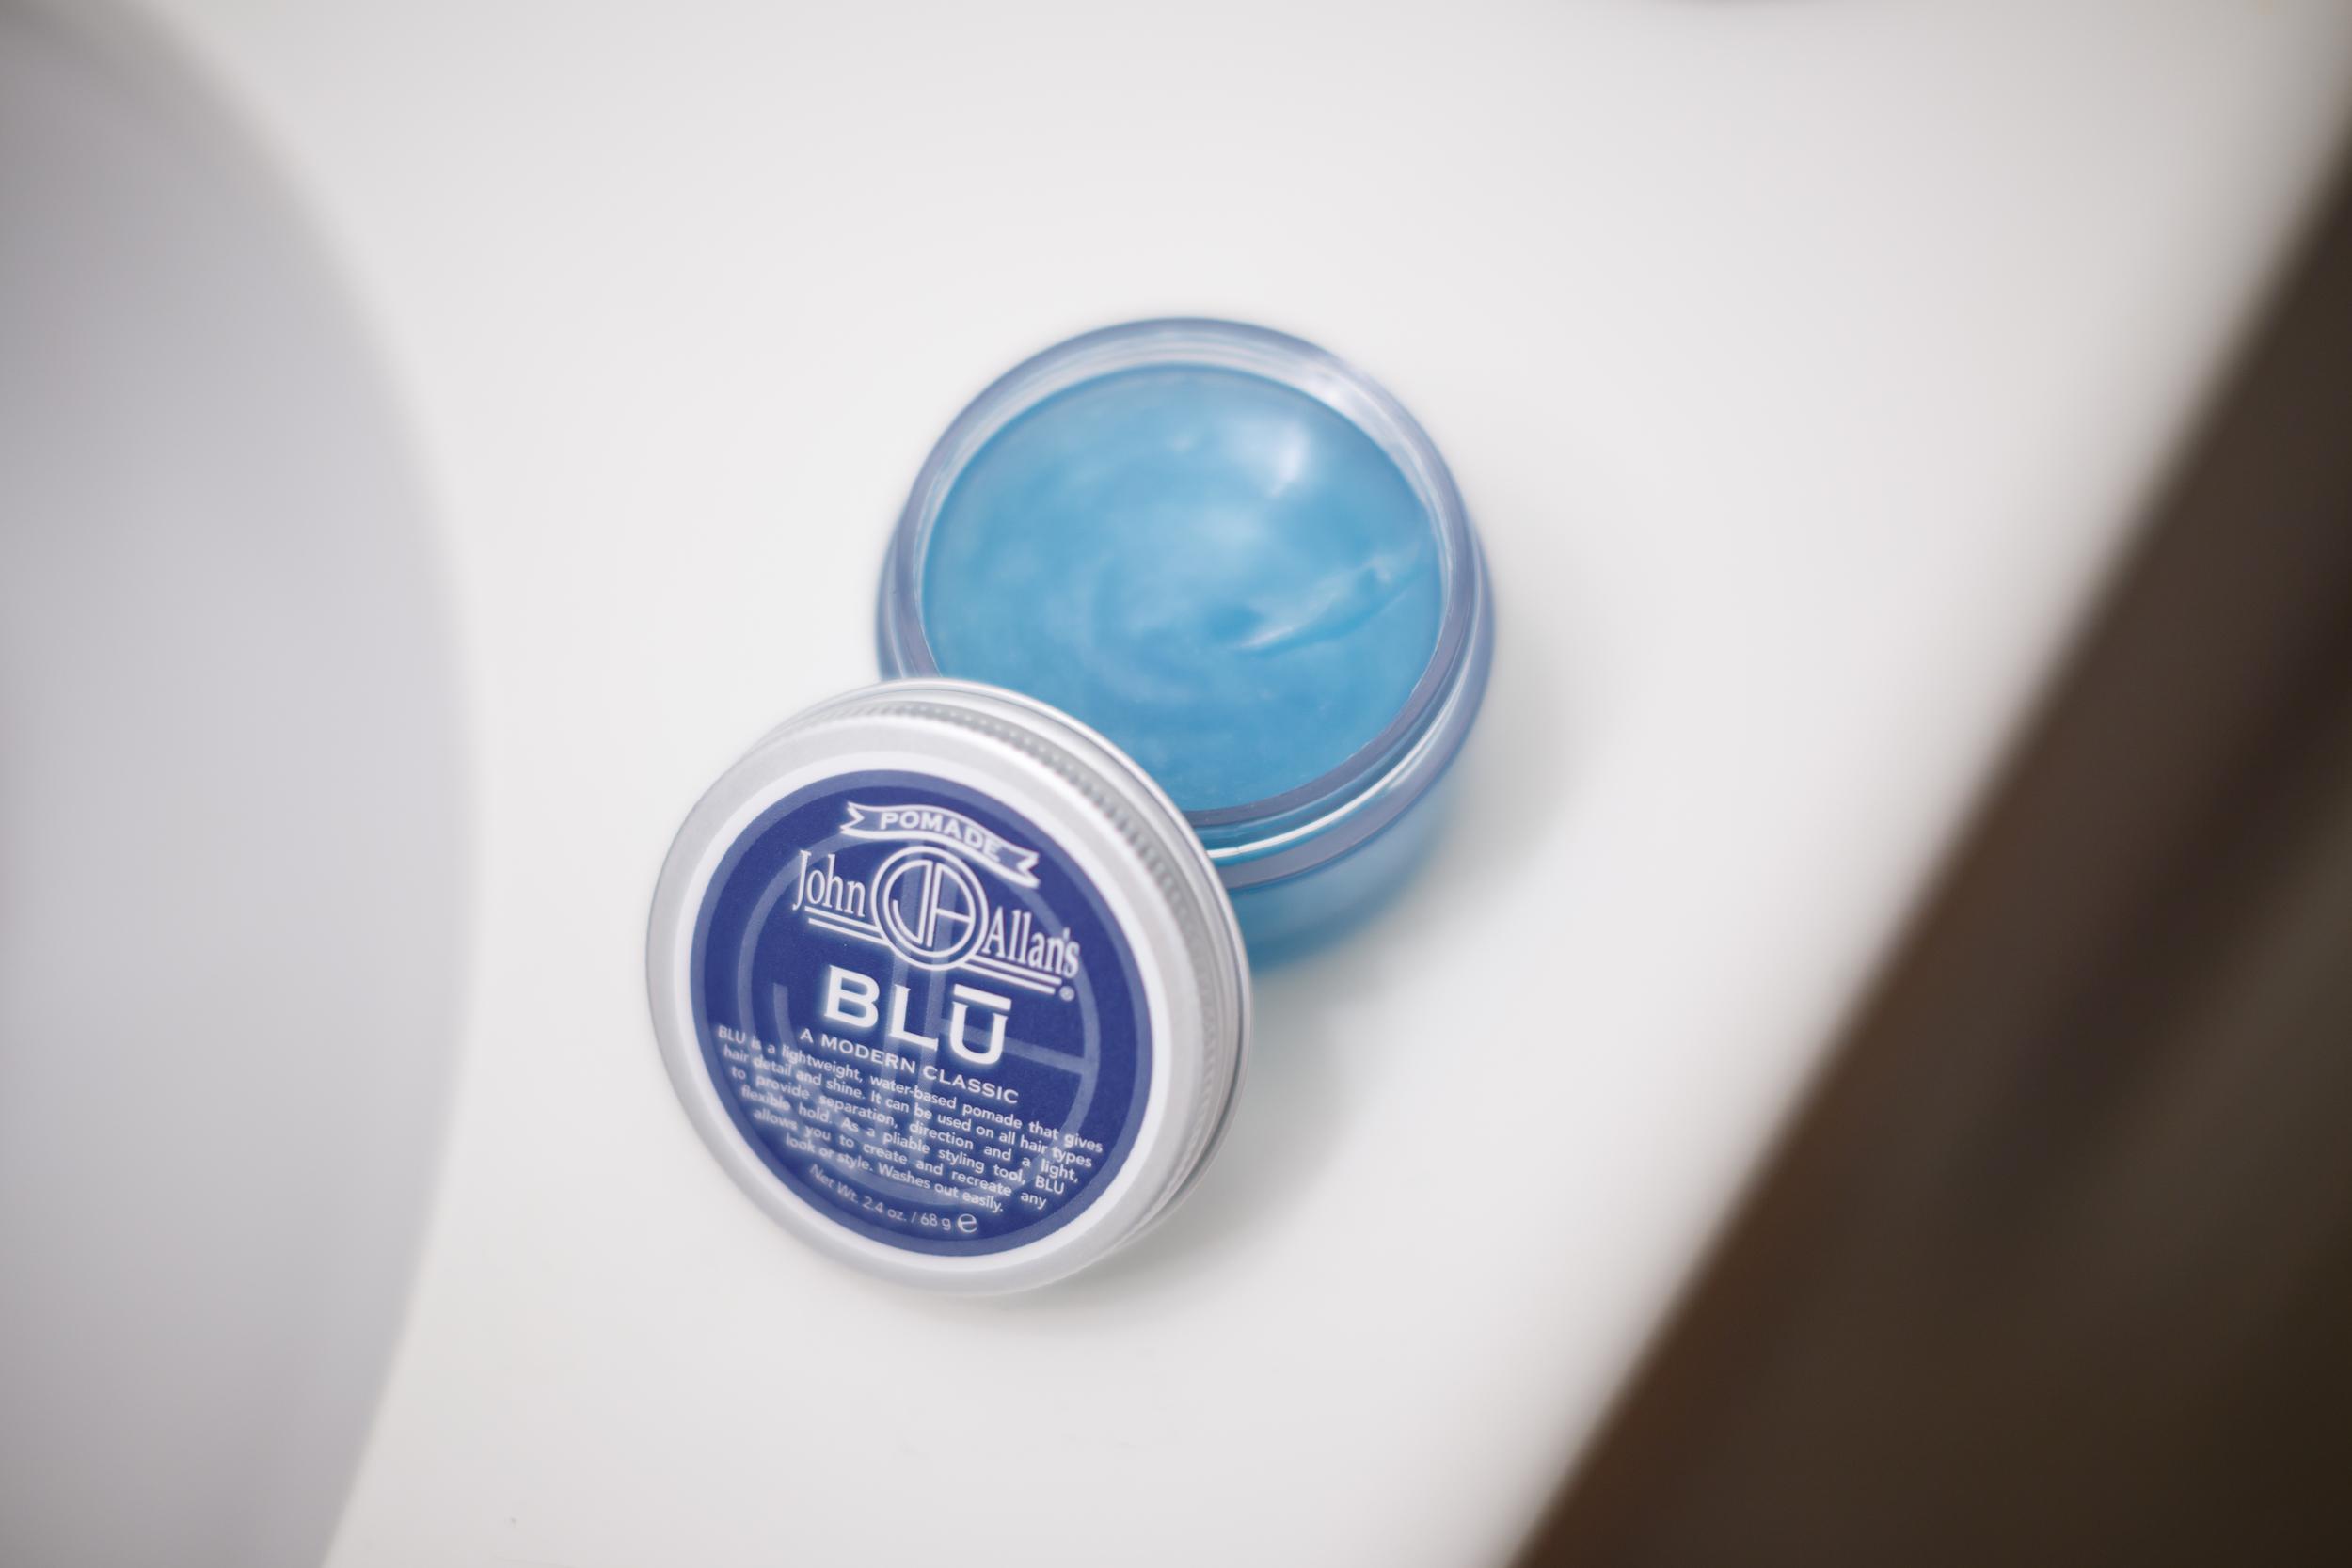 John Allan's Blu Pomade texture